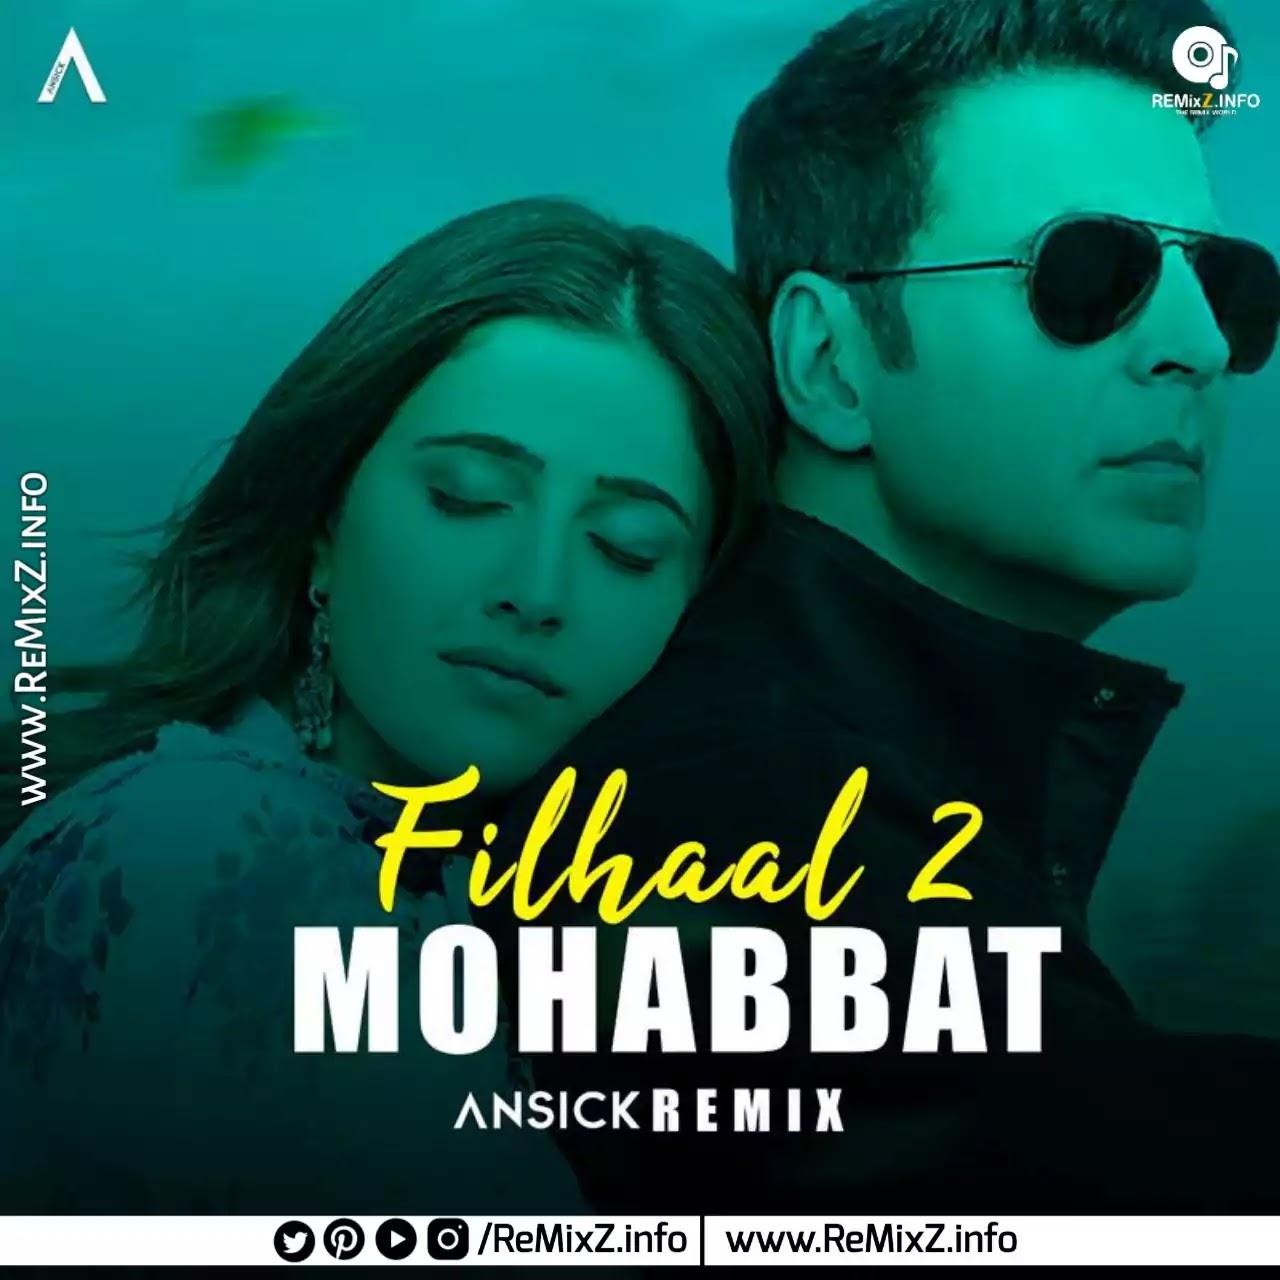 filhaal-2-mohabbat-ansick